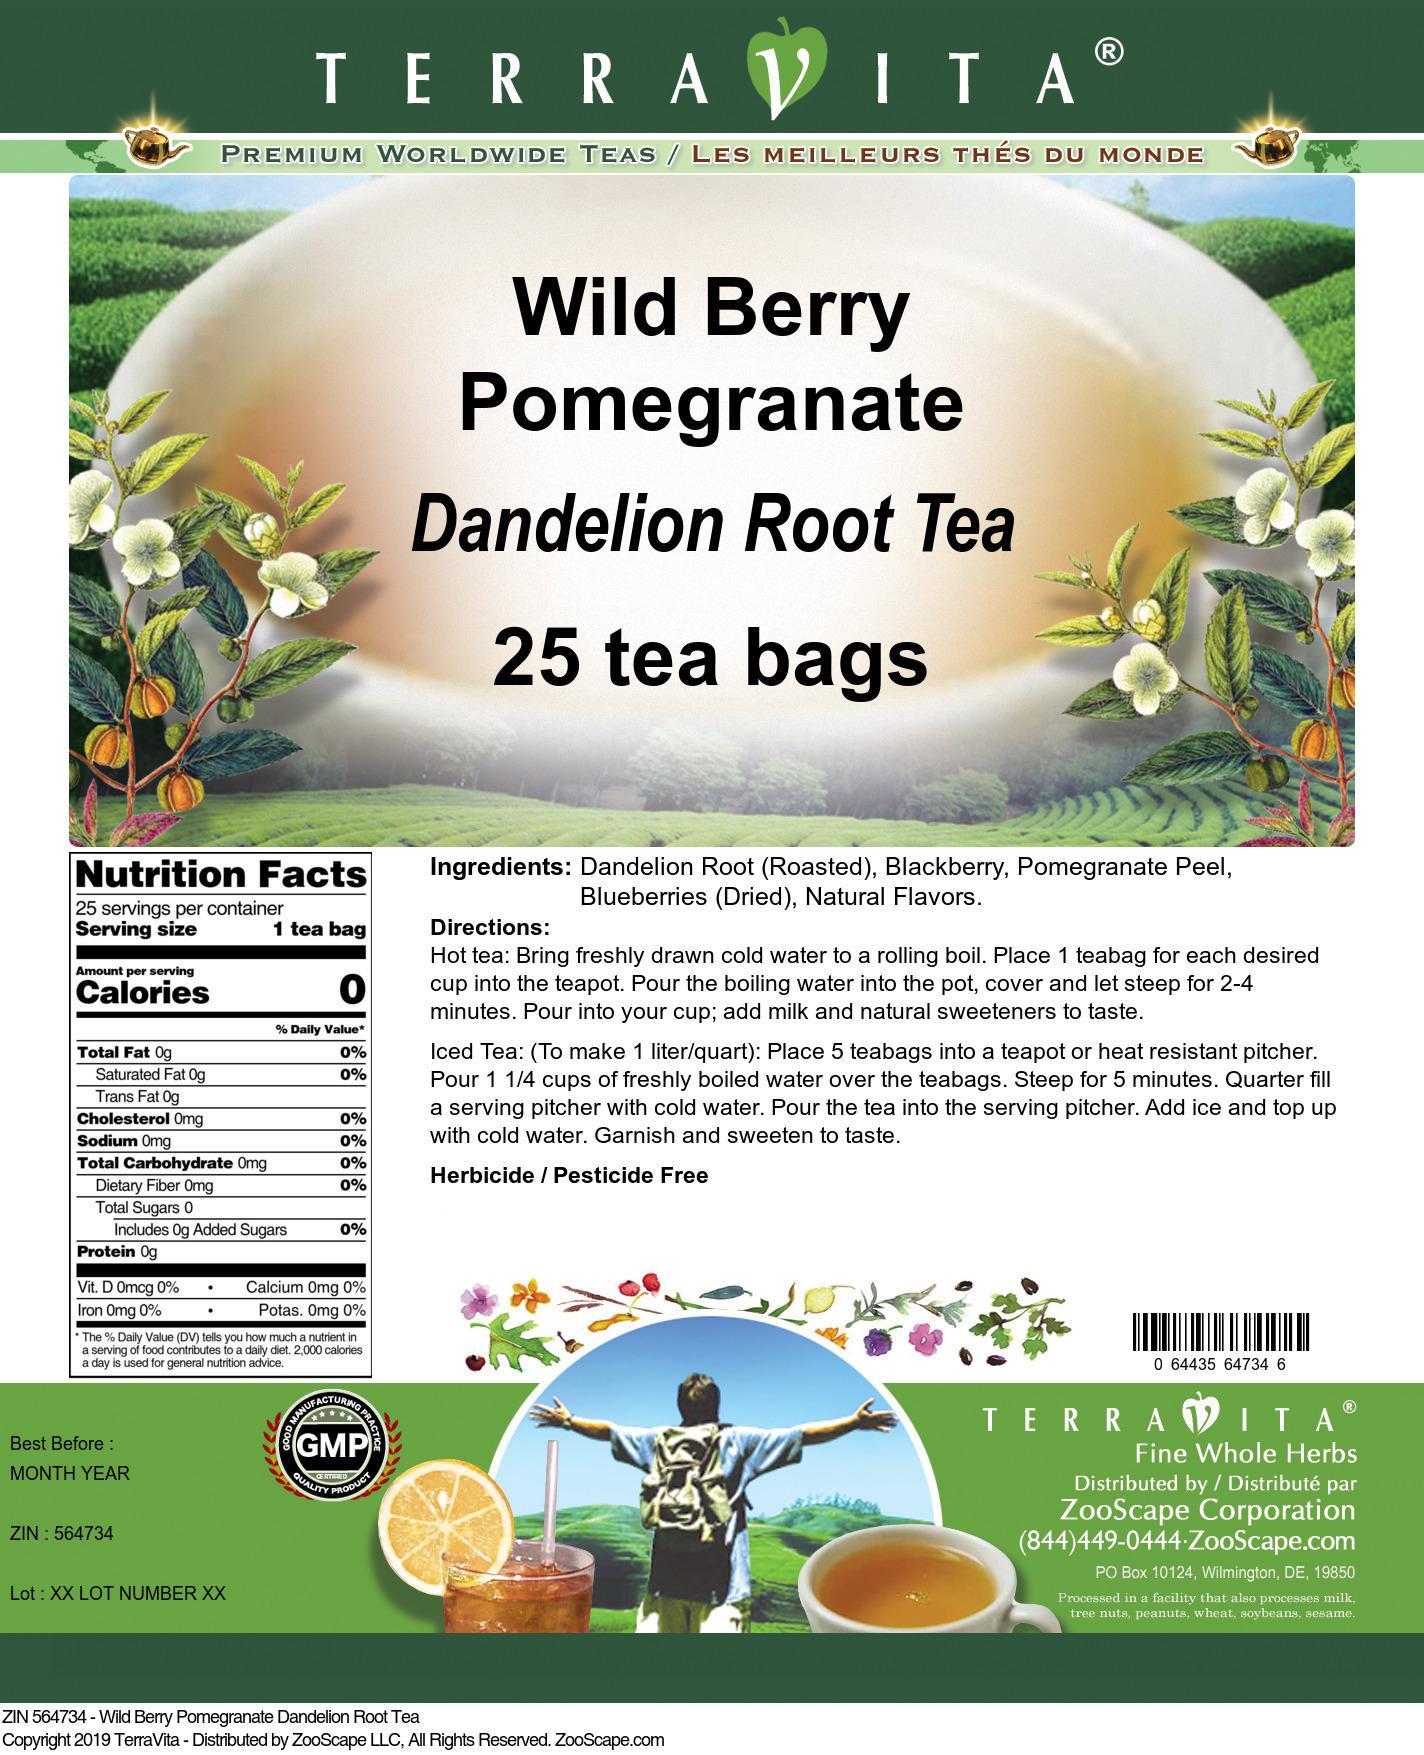 Wild Berry Pomegranate Dandelion Root